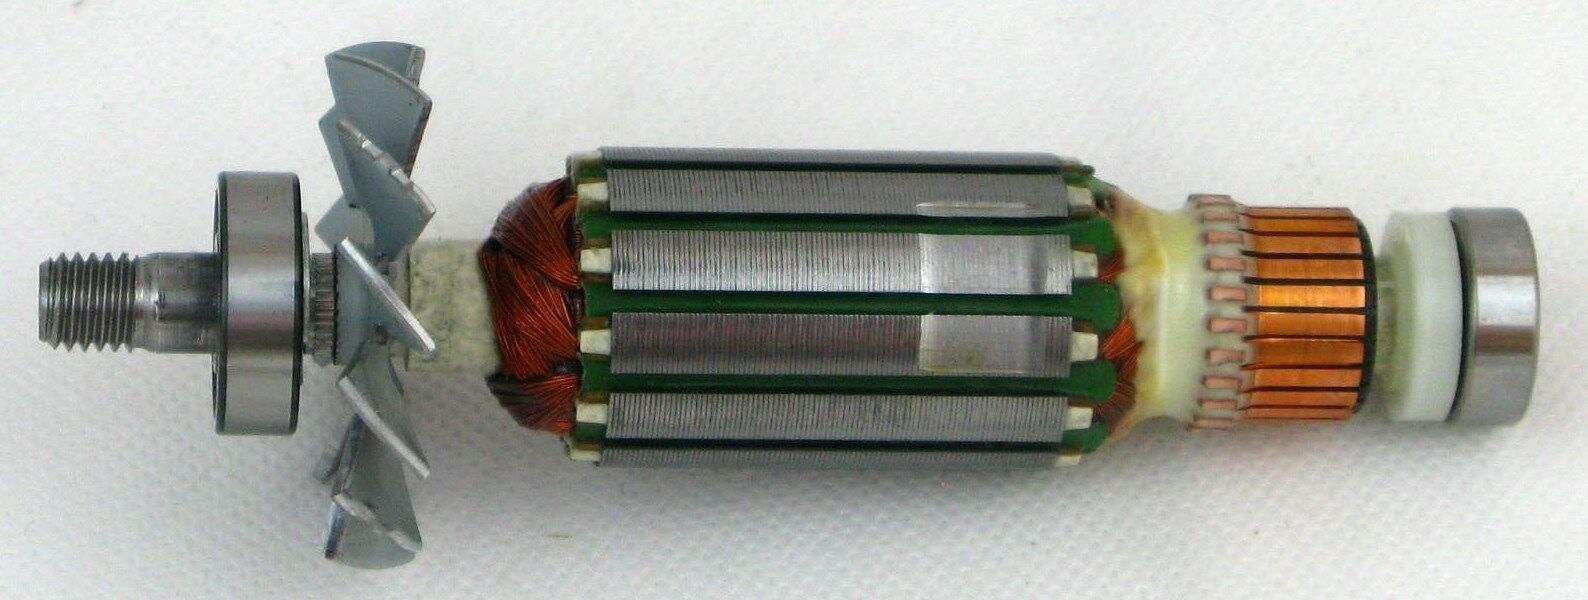 Makita Original Anker, Rotor zu N1923B, 1902, 1901, Hobel Boss 511938-9 Makita